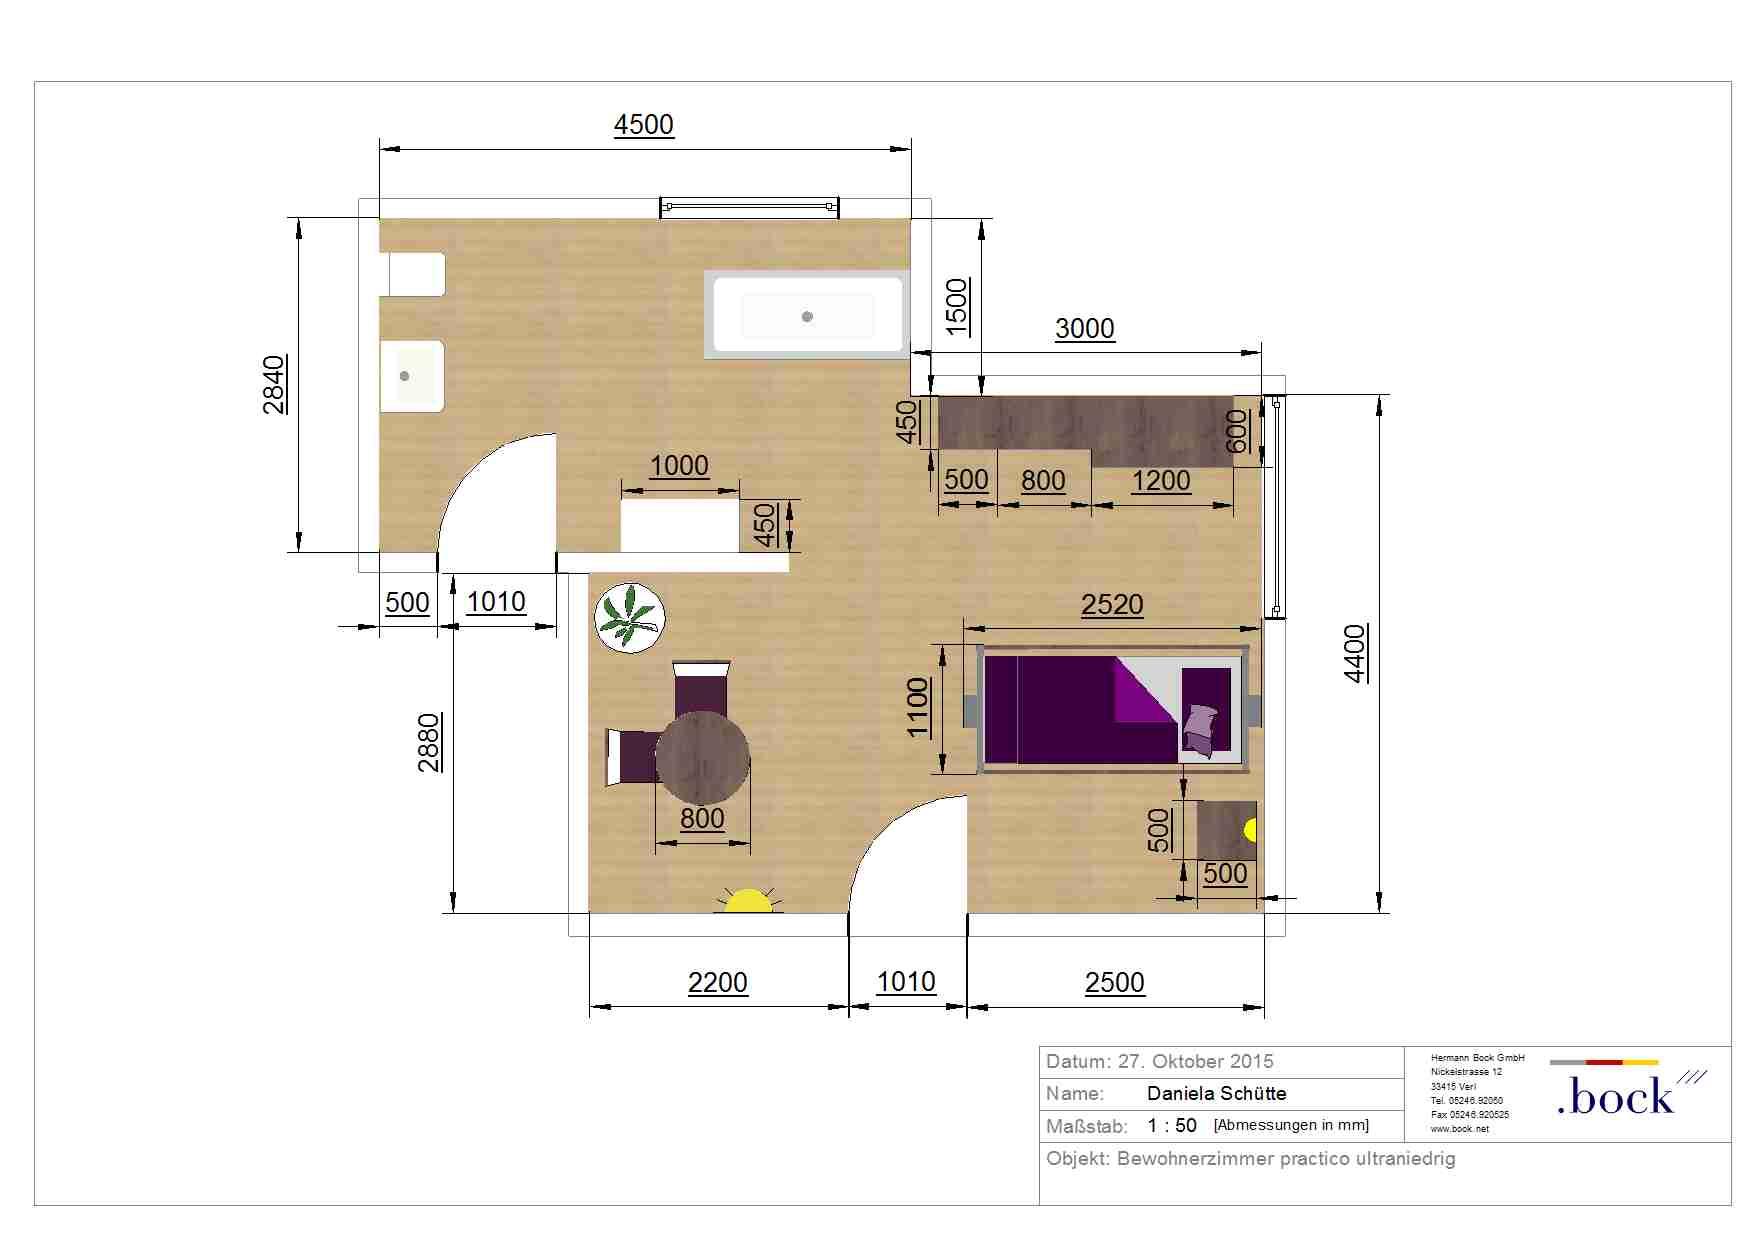 zimmer planung cheap ikea zimmer einrichten online planen haus messe with zimmer planung good. Black Bedroom Furniture Sets. Home Design Ideas